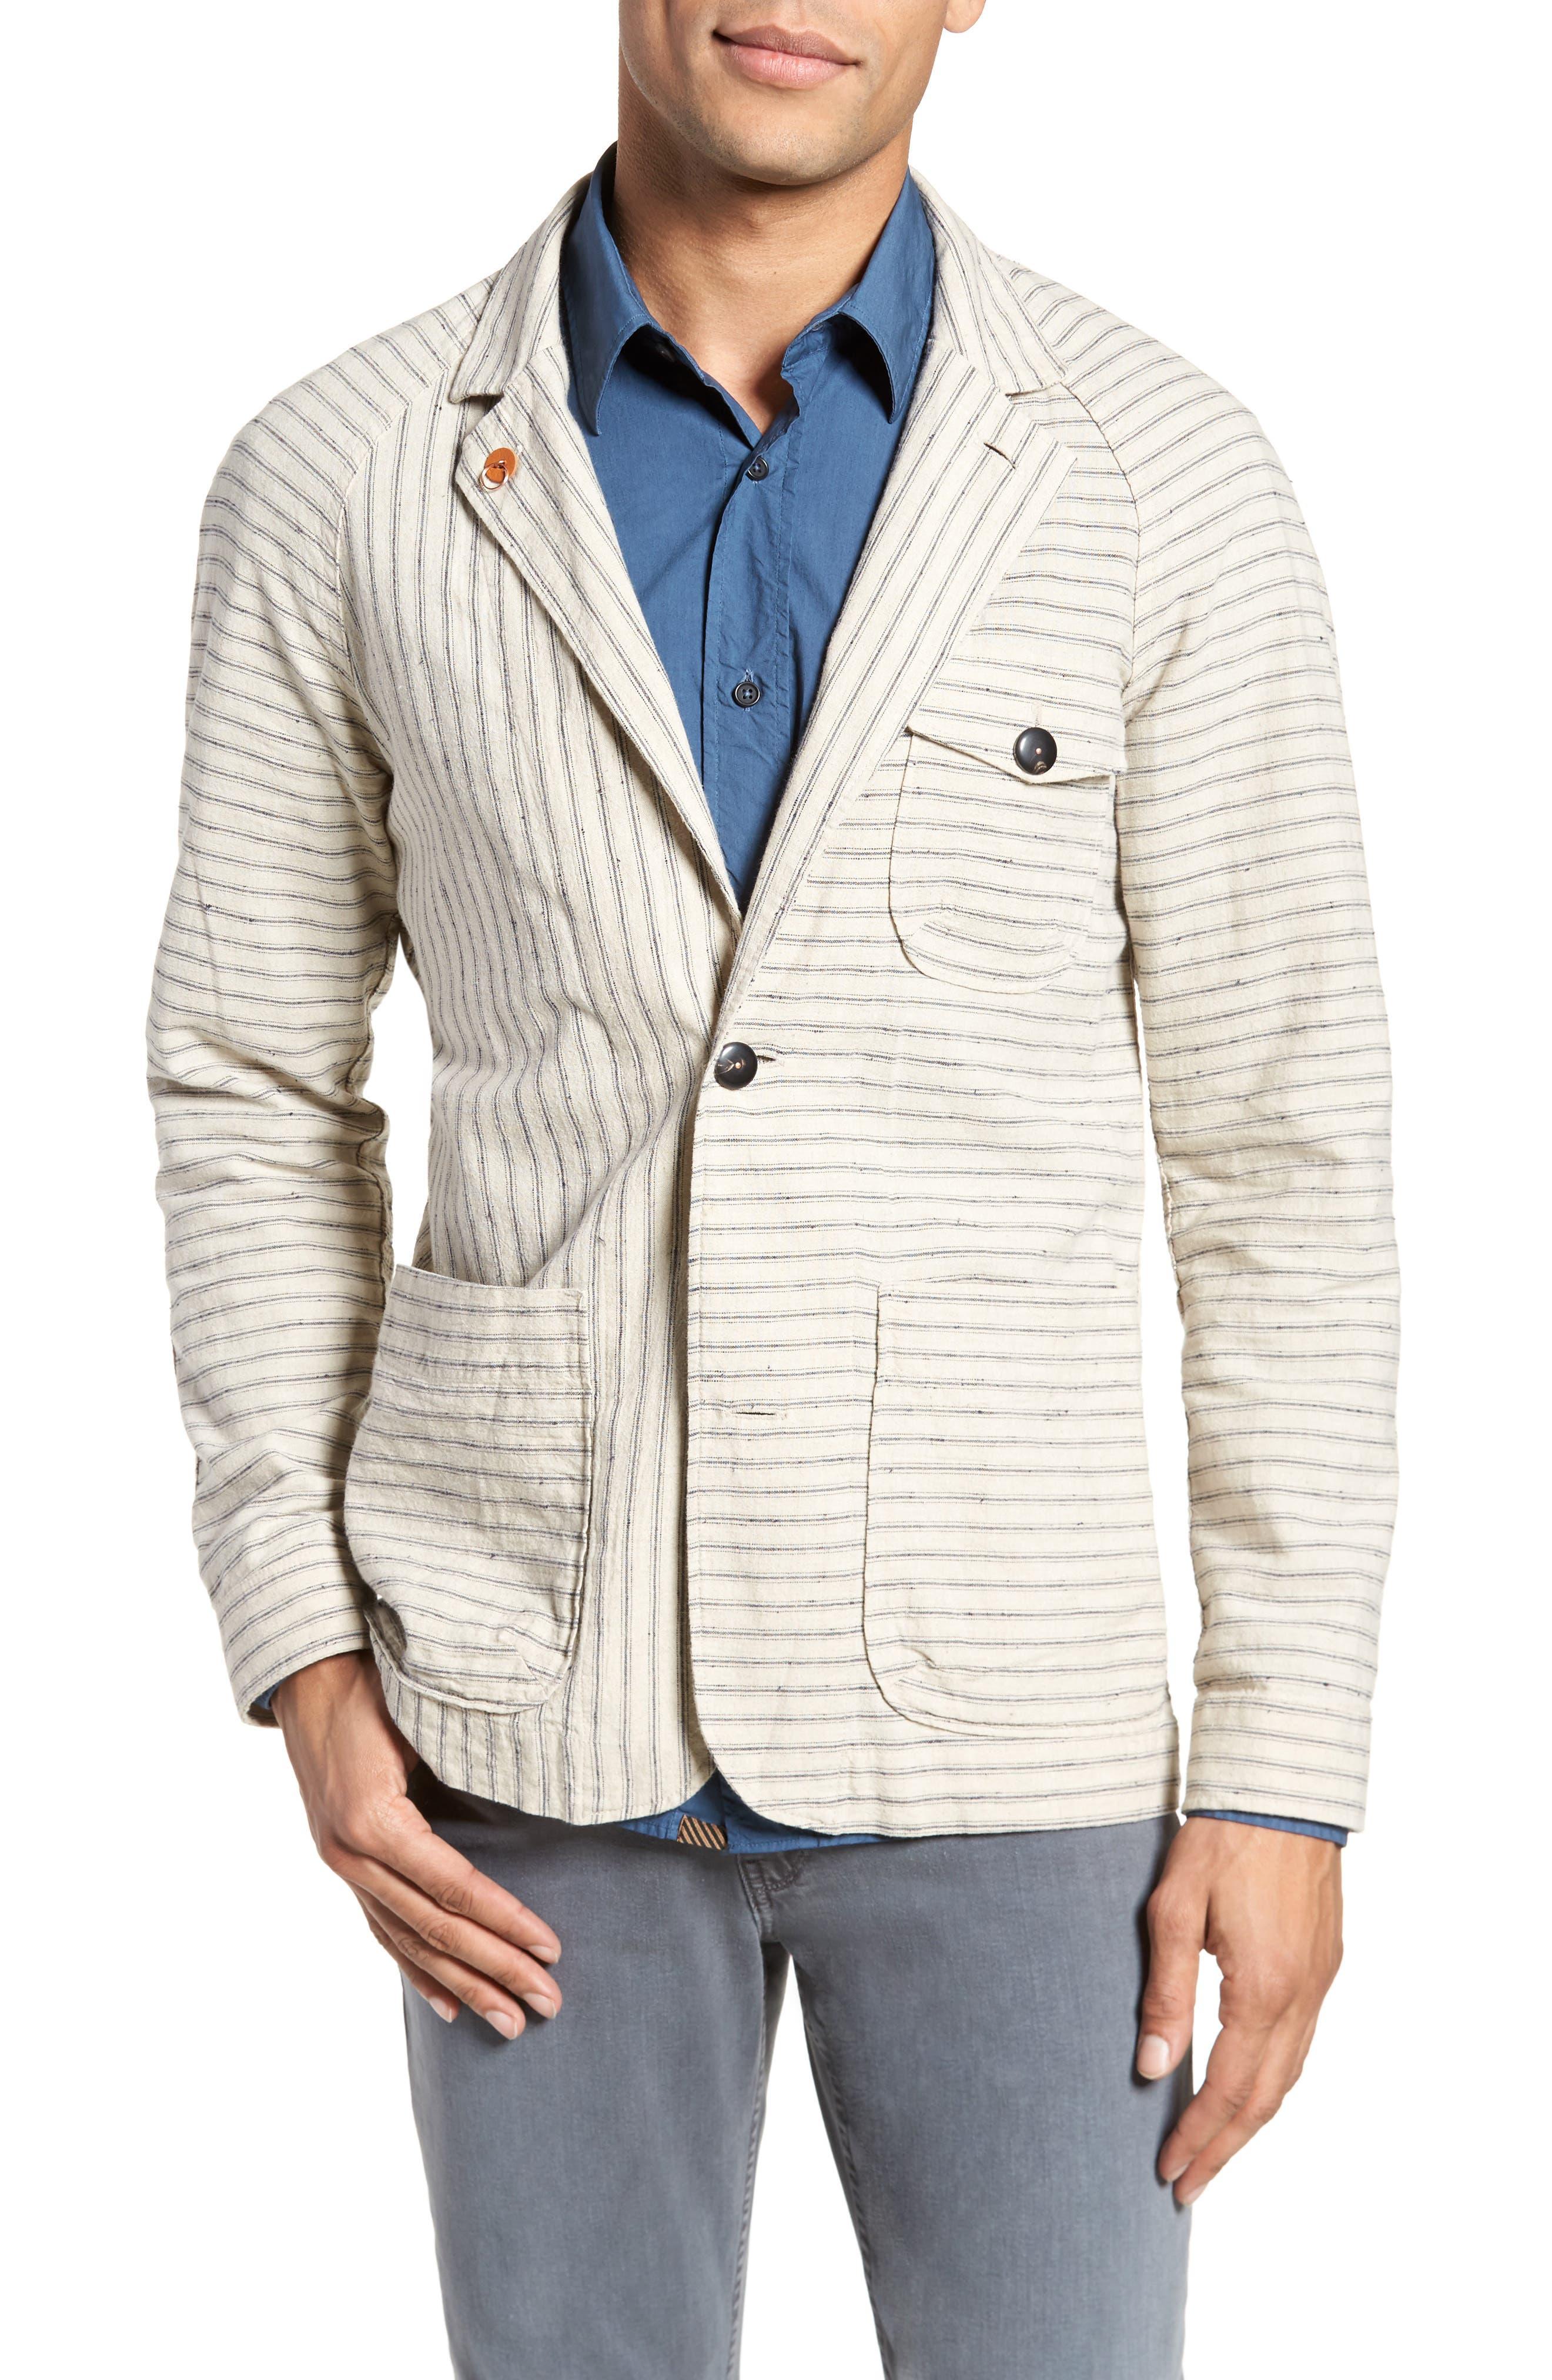 Alternate Image 1 Selected - Billy Reid Harrison Linen & Cotton Jacket